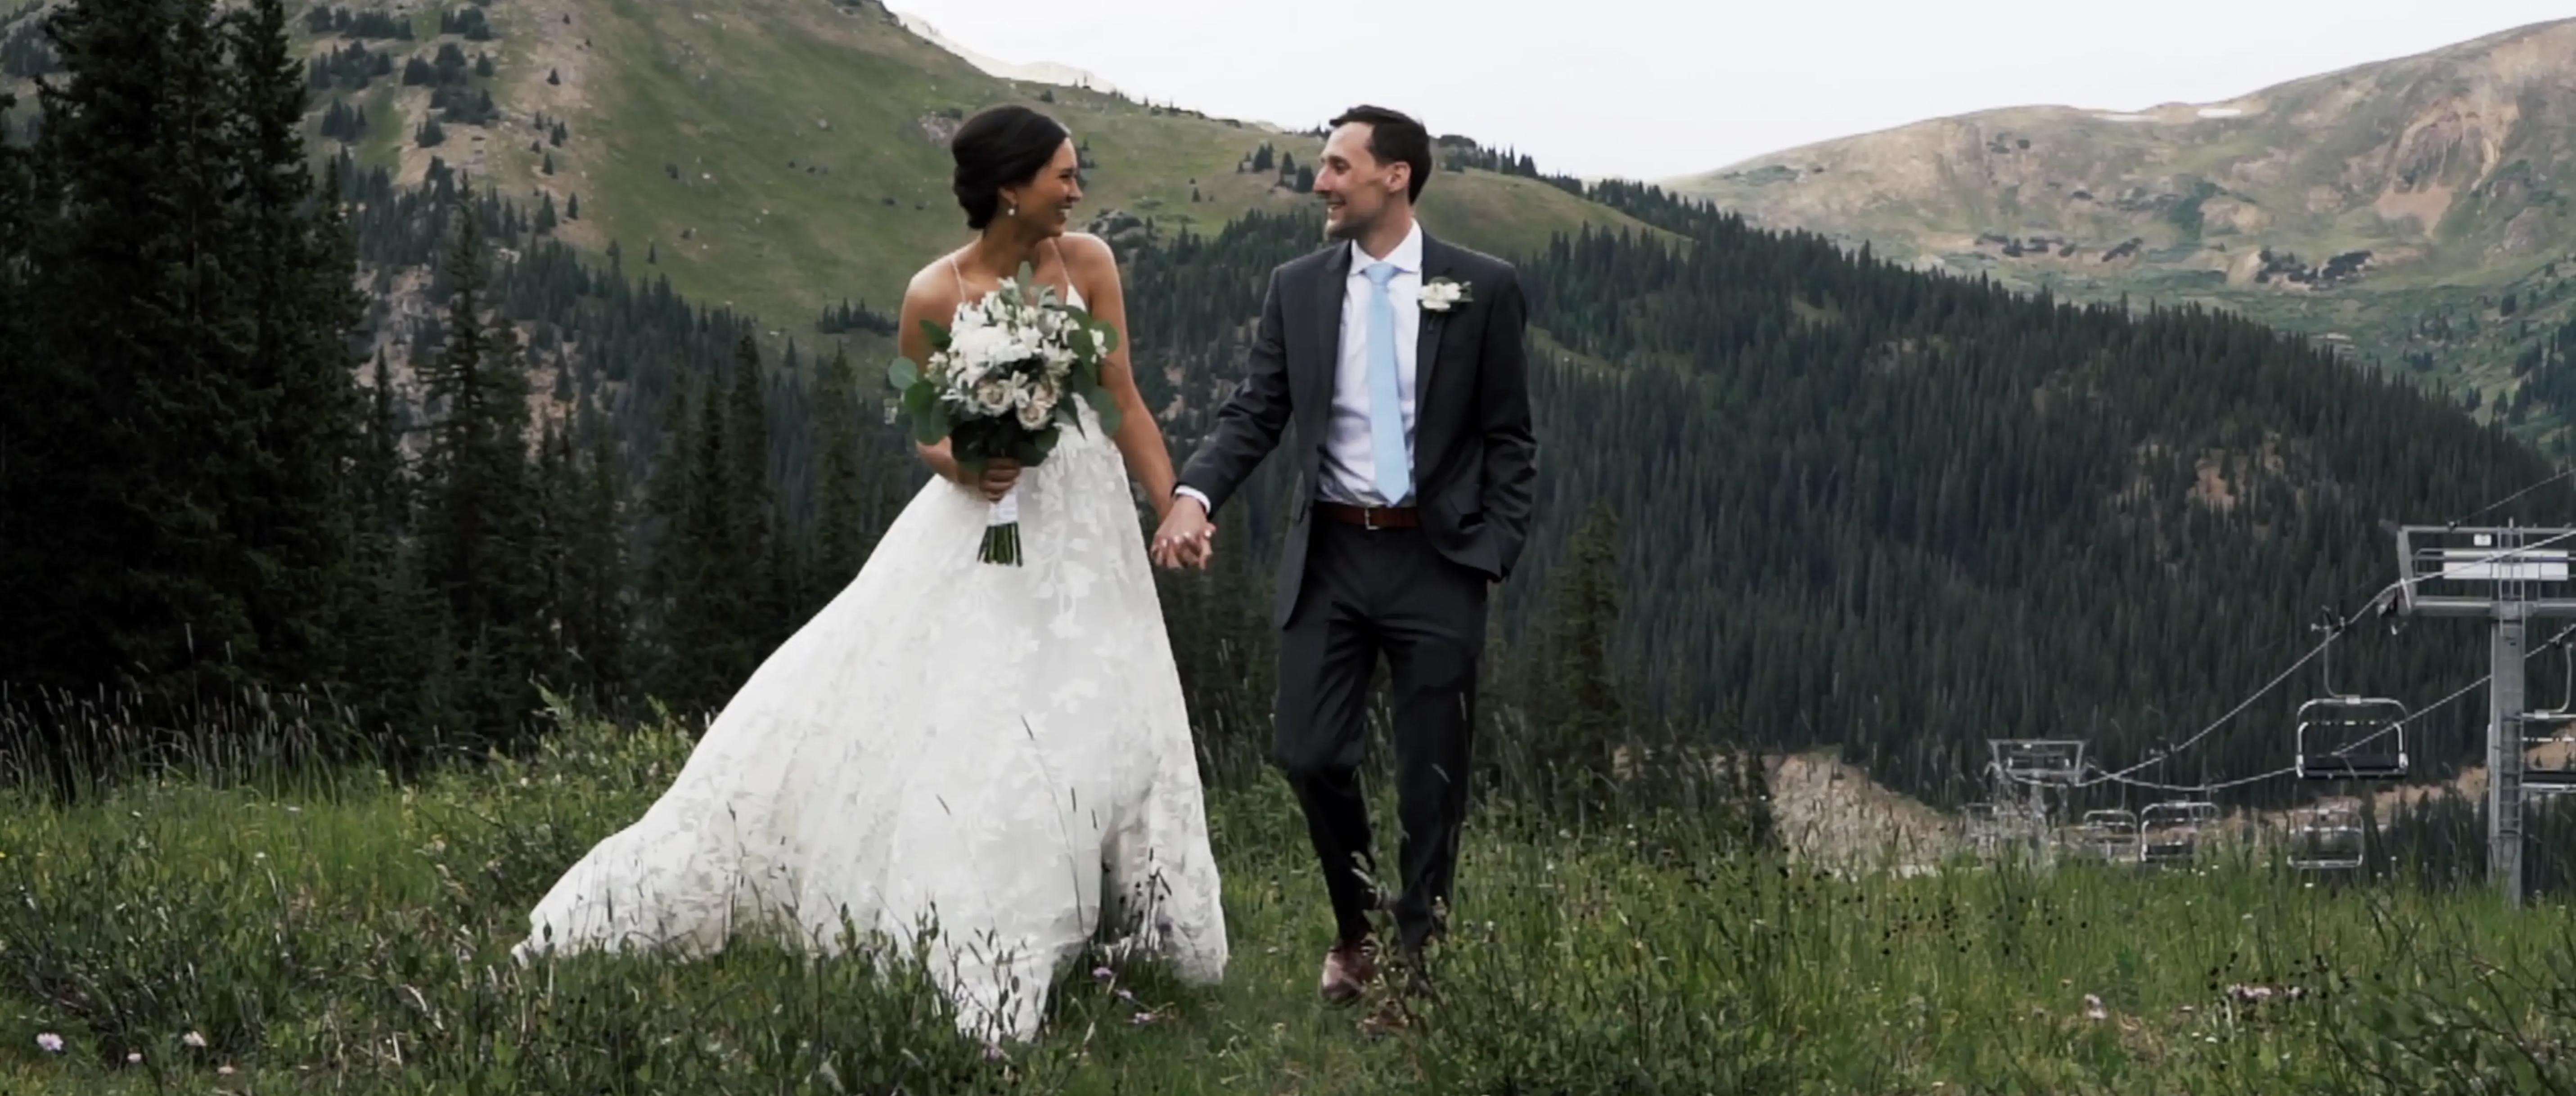 Christine + Patrick | Keystone, Colorado | Black Mountain Lodge